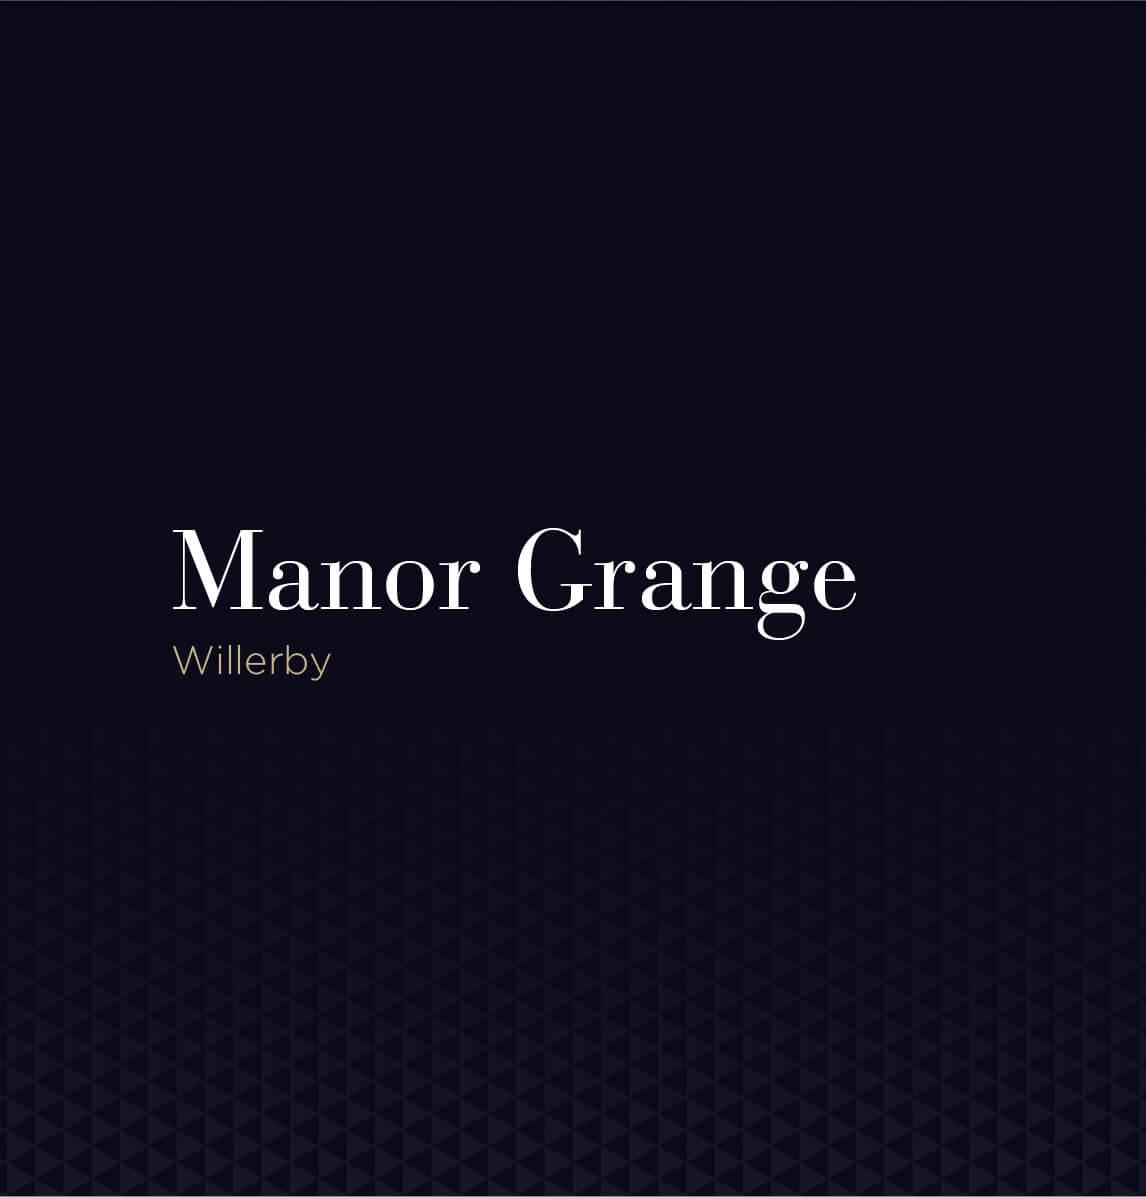 Manor Grange, Willerby